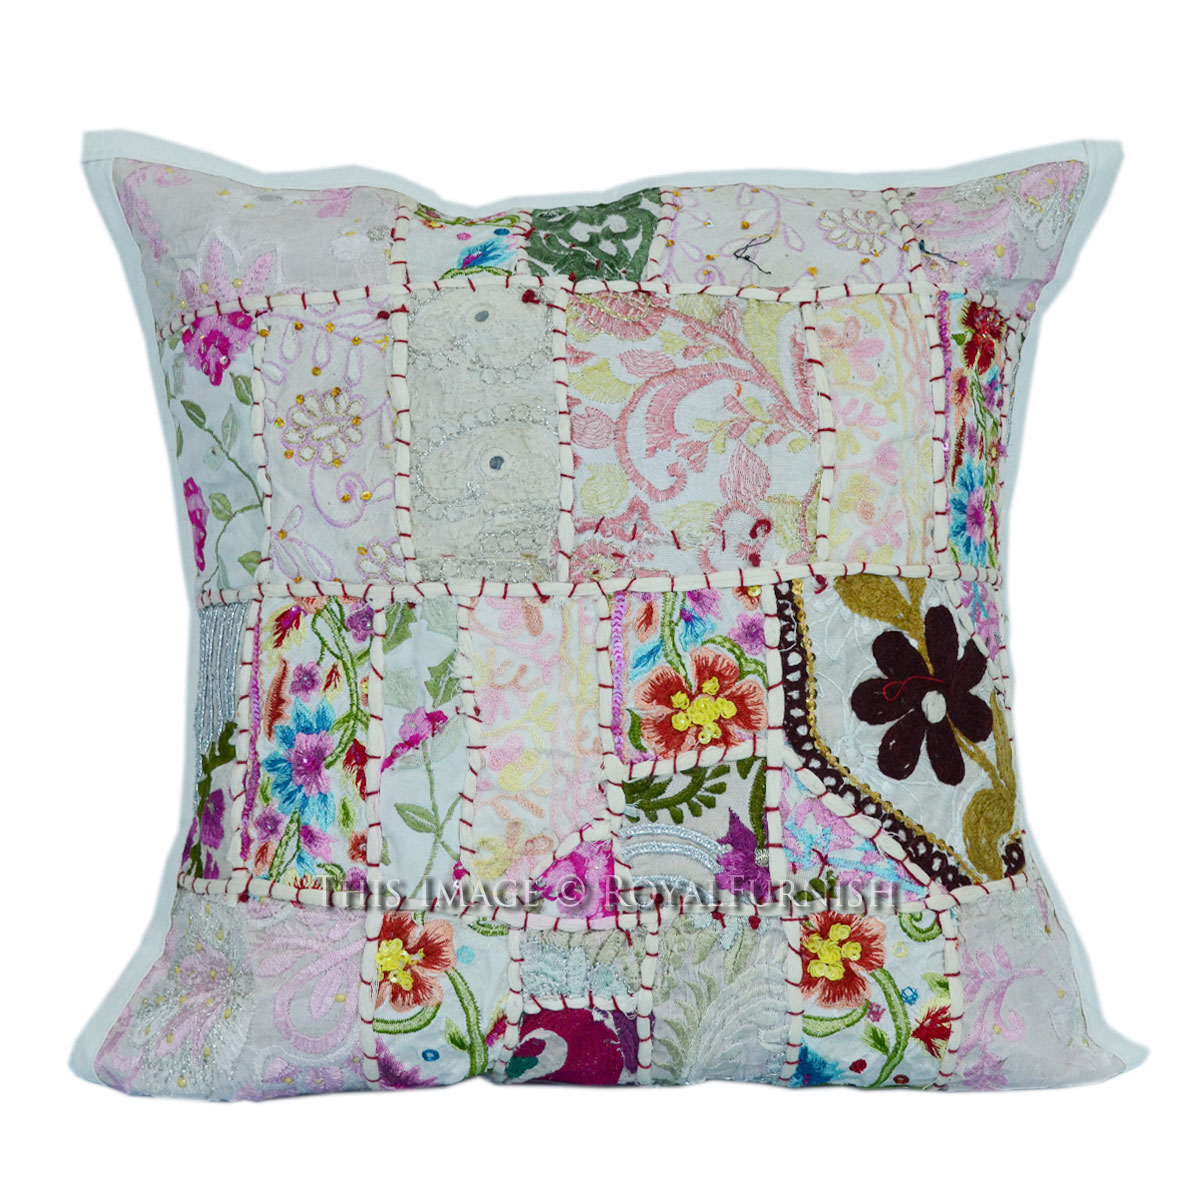 White Decorative Pillow Shams : 40x40 cm. Decorative White Sari Patchwork Throw Pillow Sham - RoyalFurnish.com